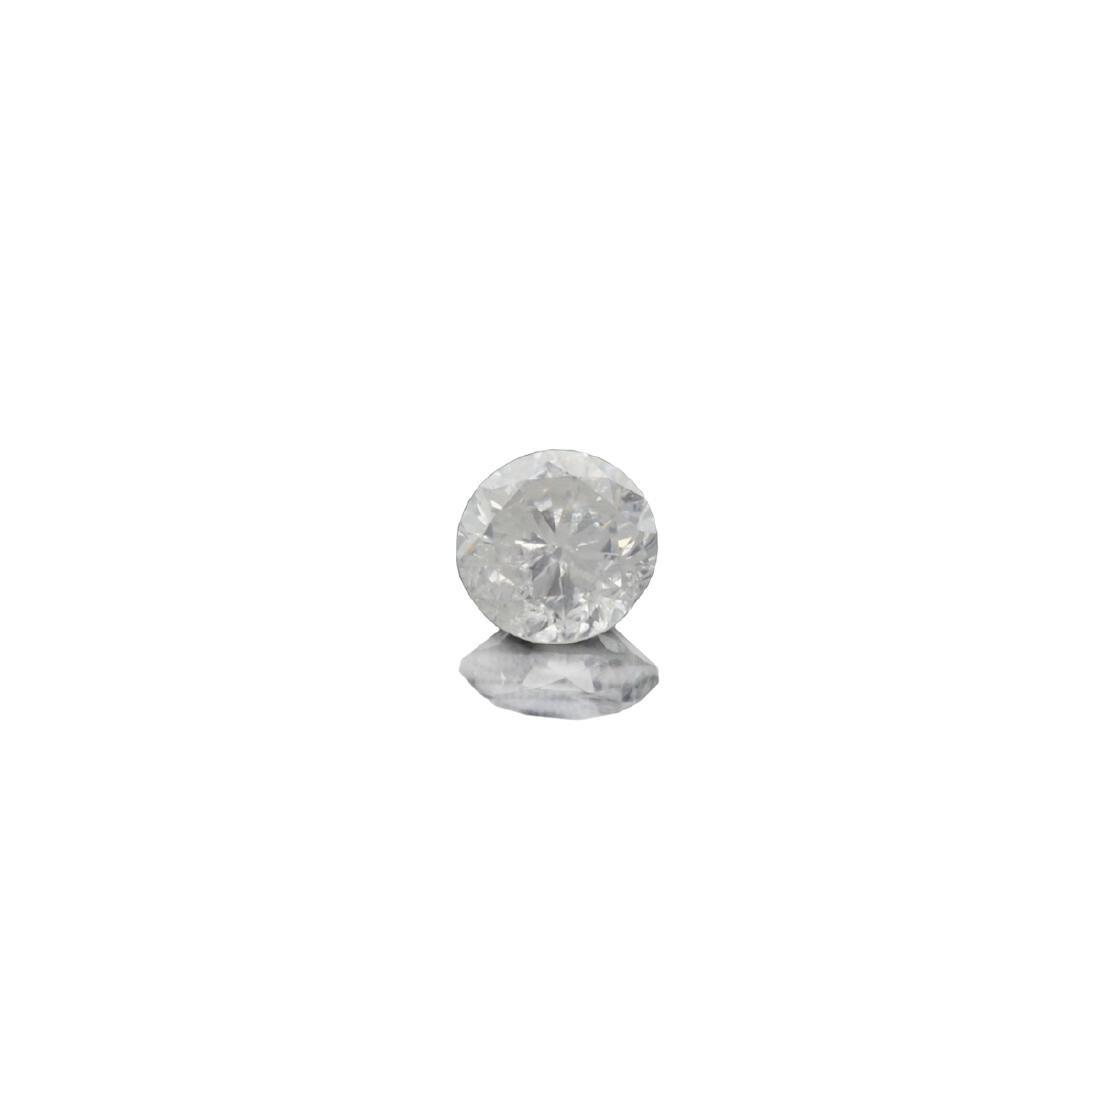 Fine Jewelry GIA Certified 0.17CT Round Brilliant Cut